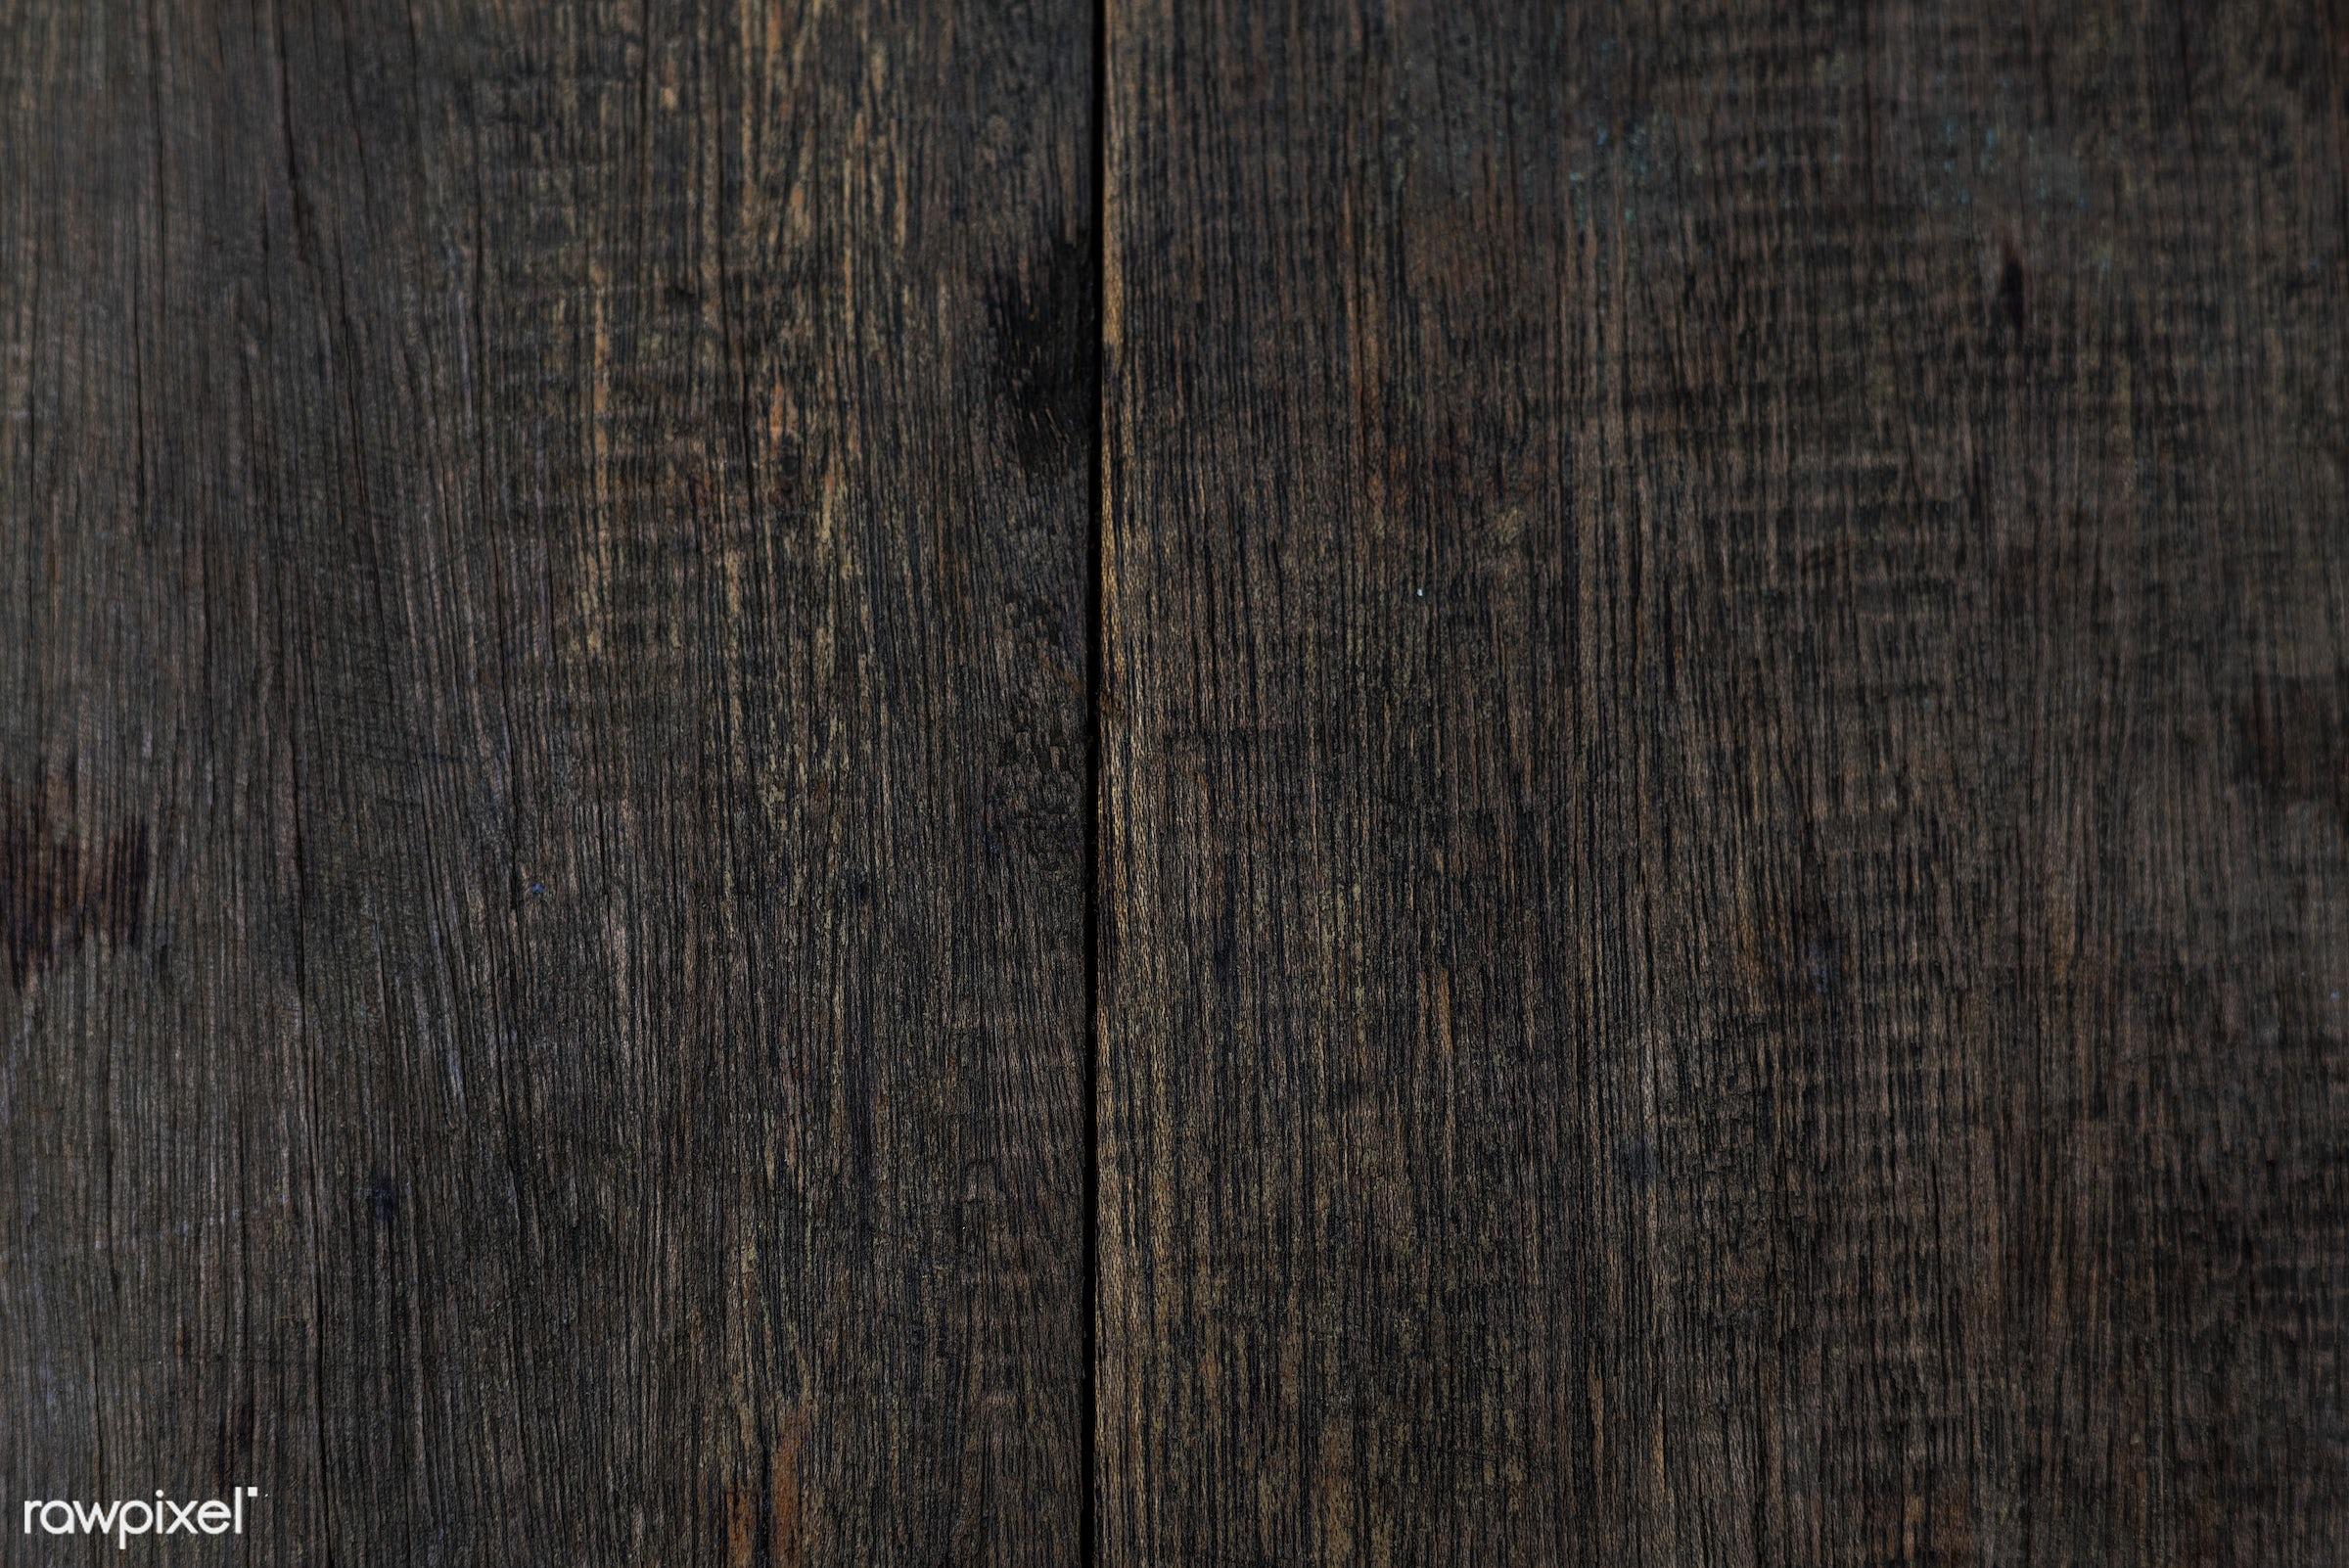 old, hardwood, surface, wood, decorative, carpentry, retro, plank, space, rustic, aged, decor, grunge, dark, empty, striped...